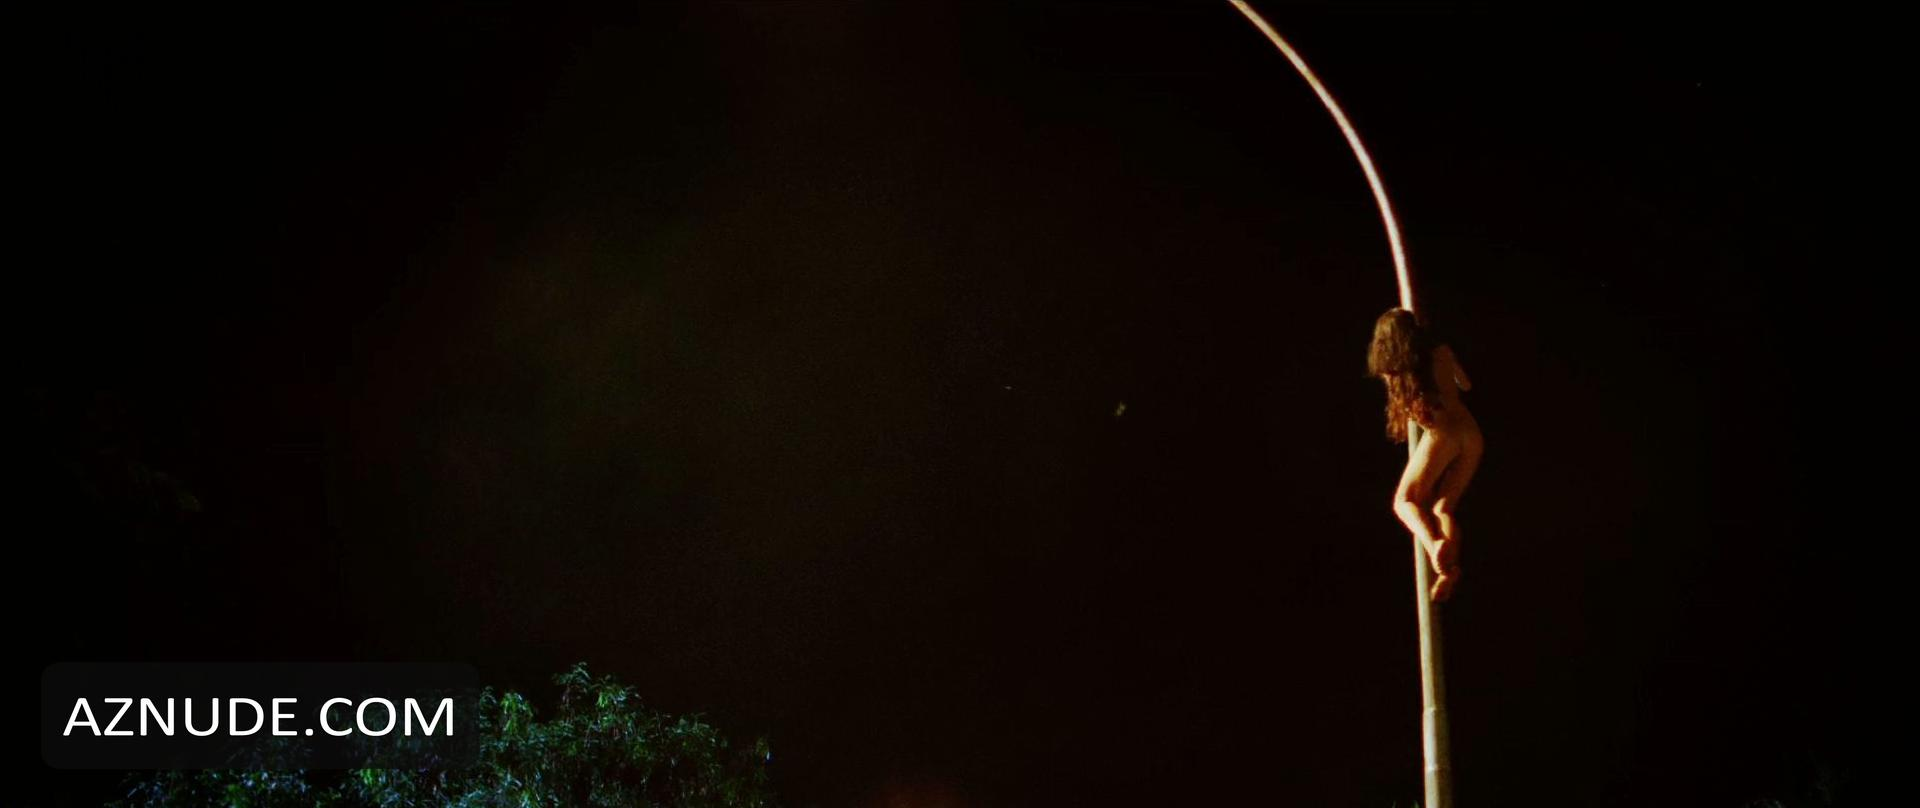 Hayley orrantia nude pics-4749